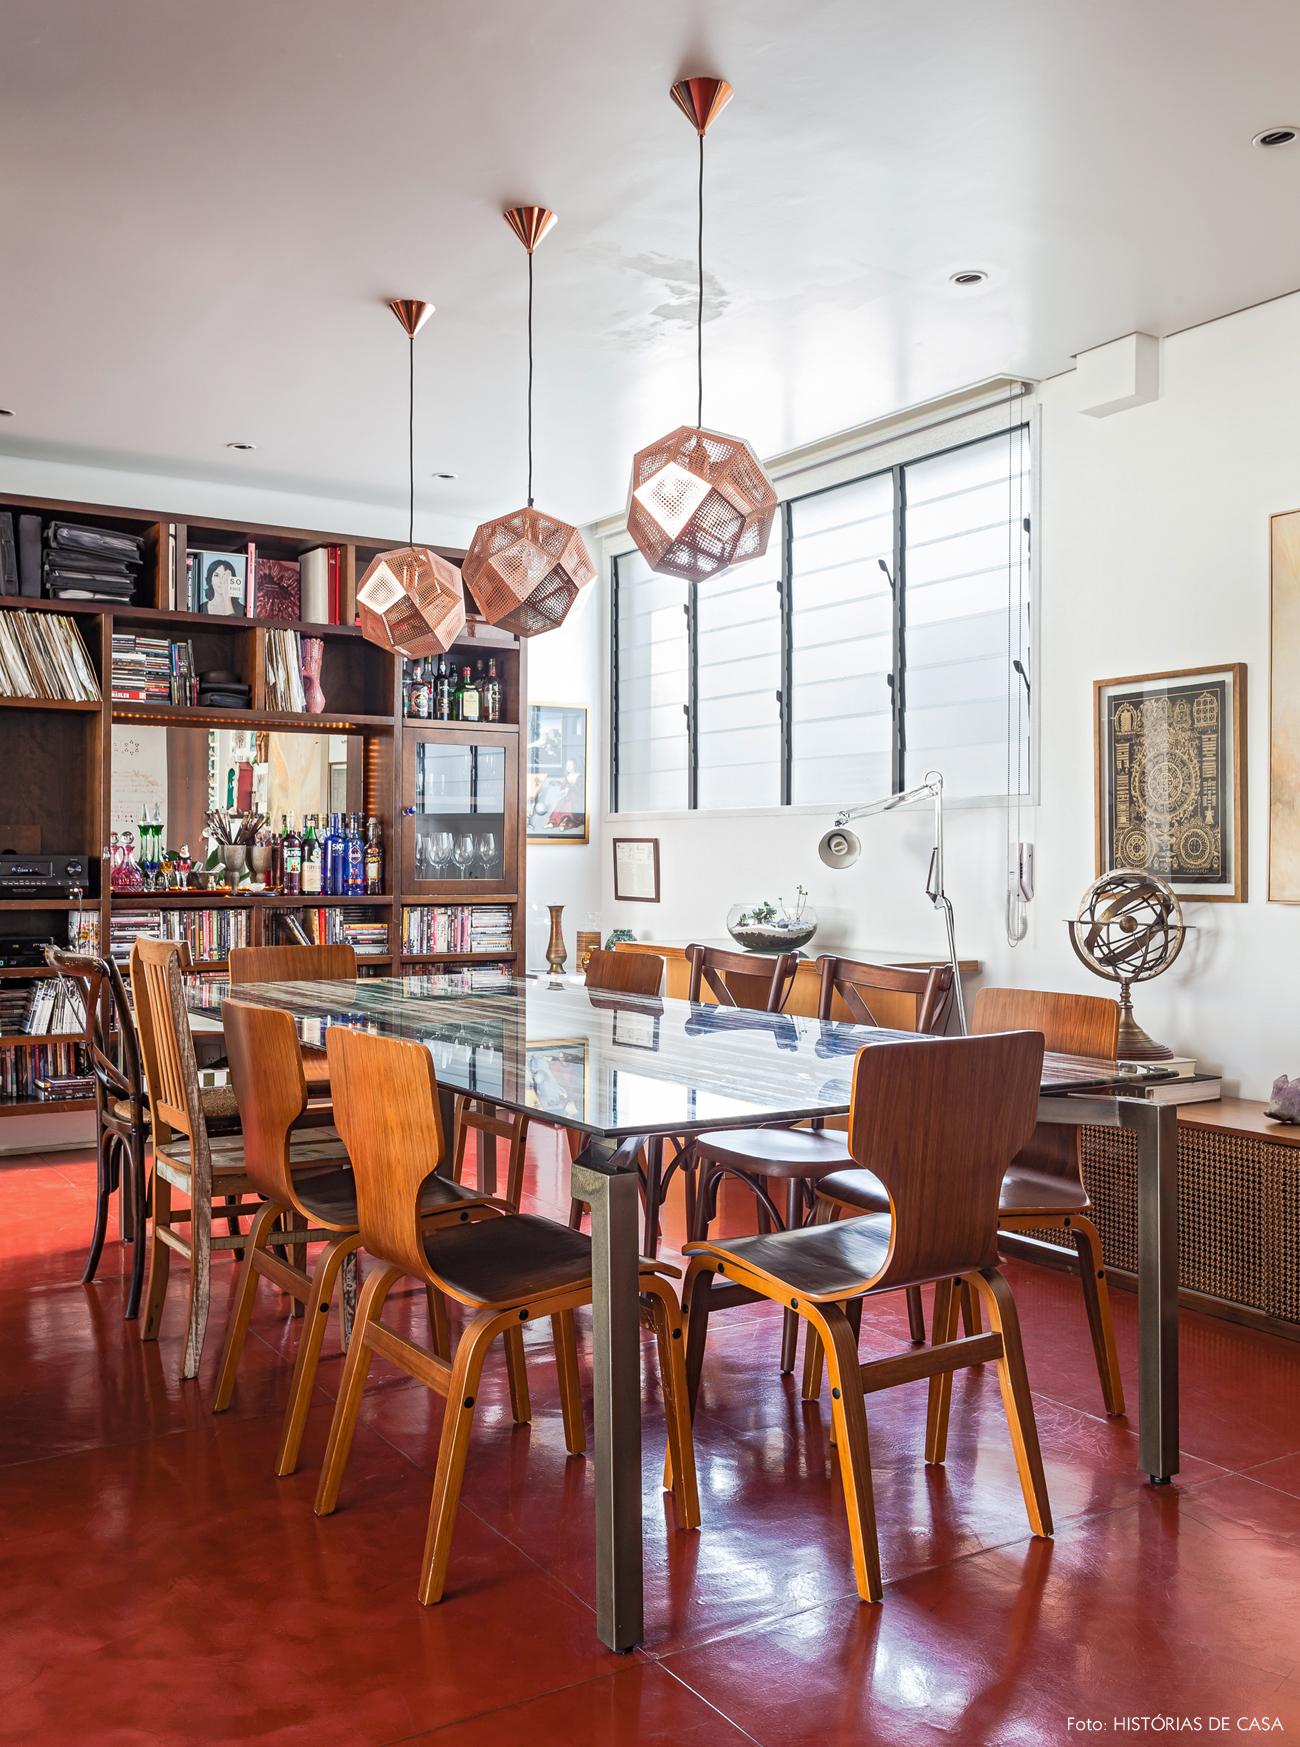 18-decoracao-apartamento-sala-de-jantar-piso-de-cimento-queimado